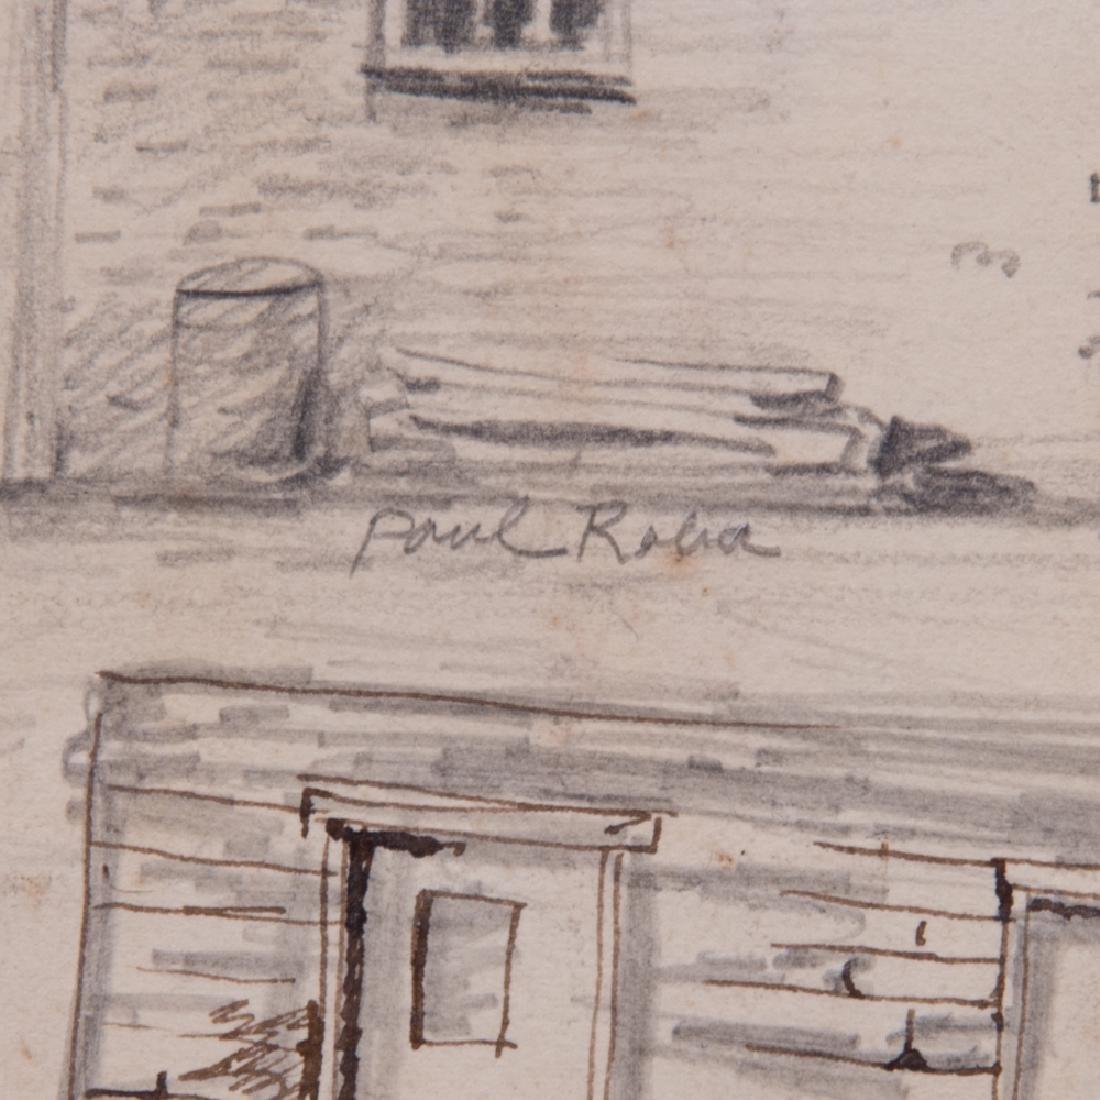 Paul Riba (1912-1977) A Group of Five Studies, Pencil - 3